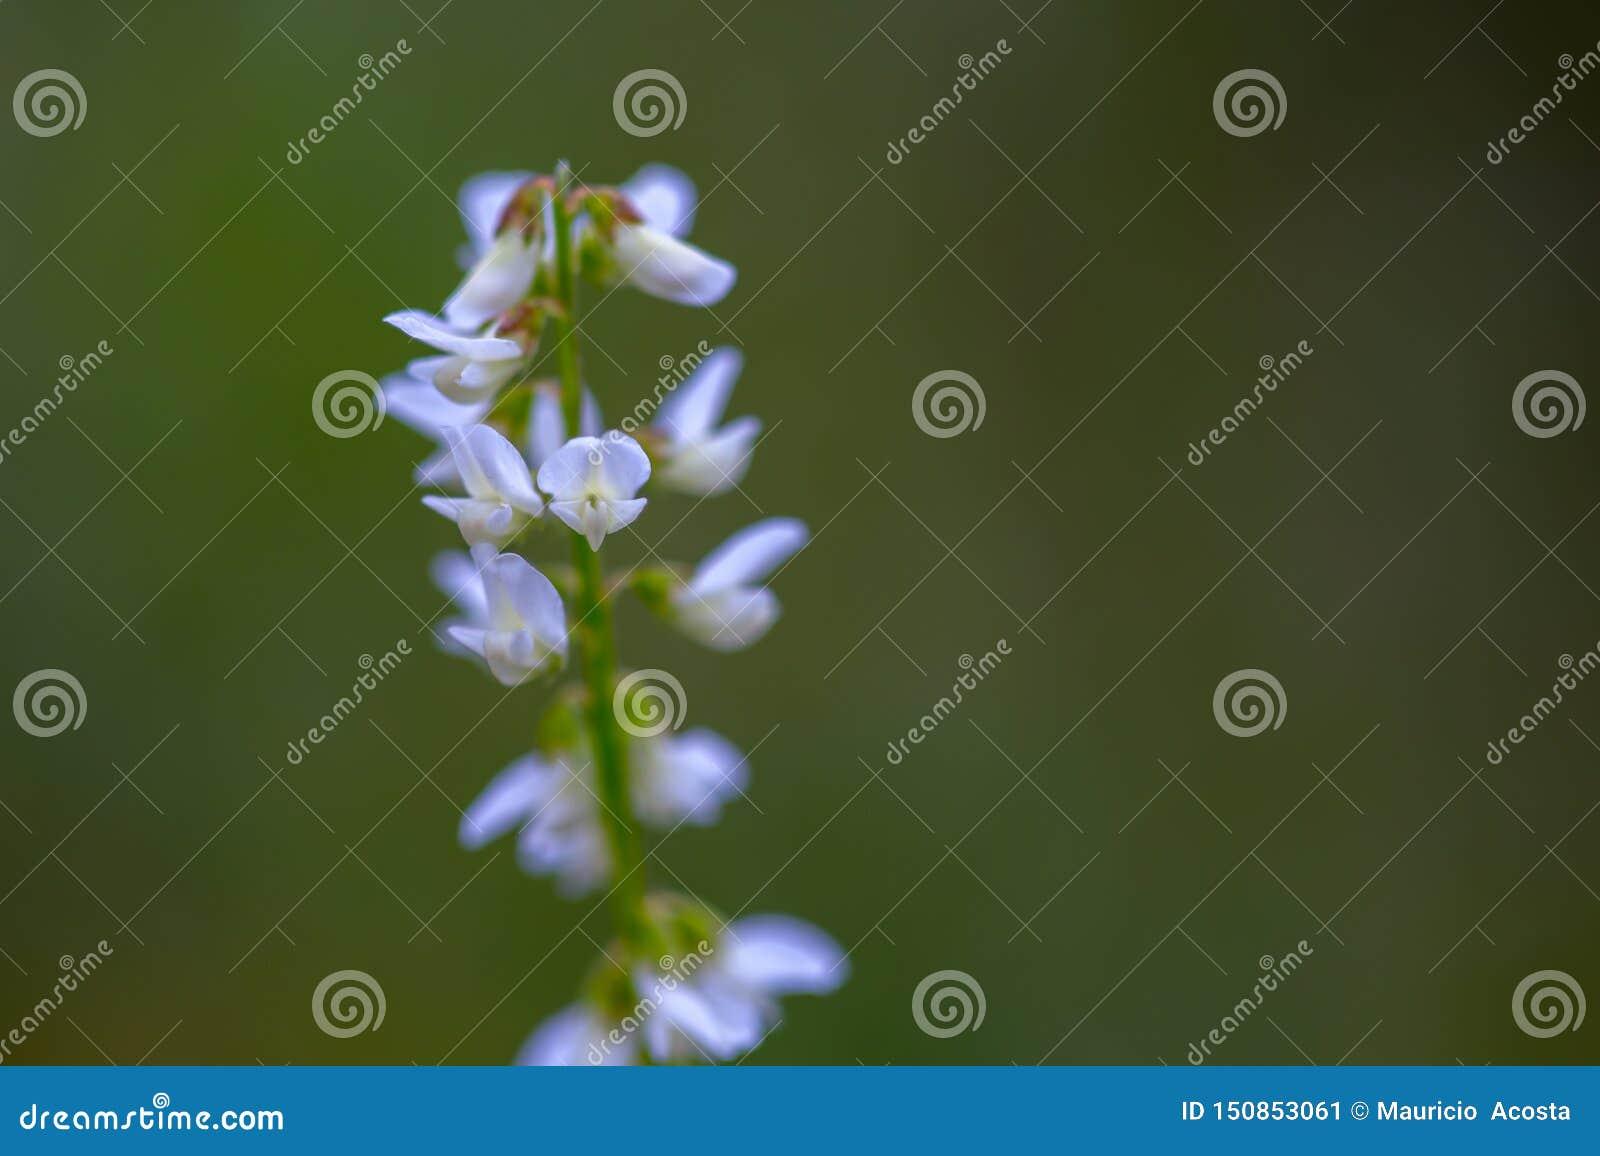 Macro photography of very tiny white wildflowers